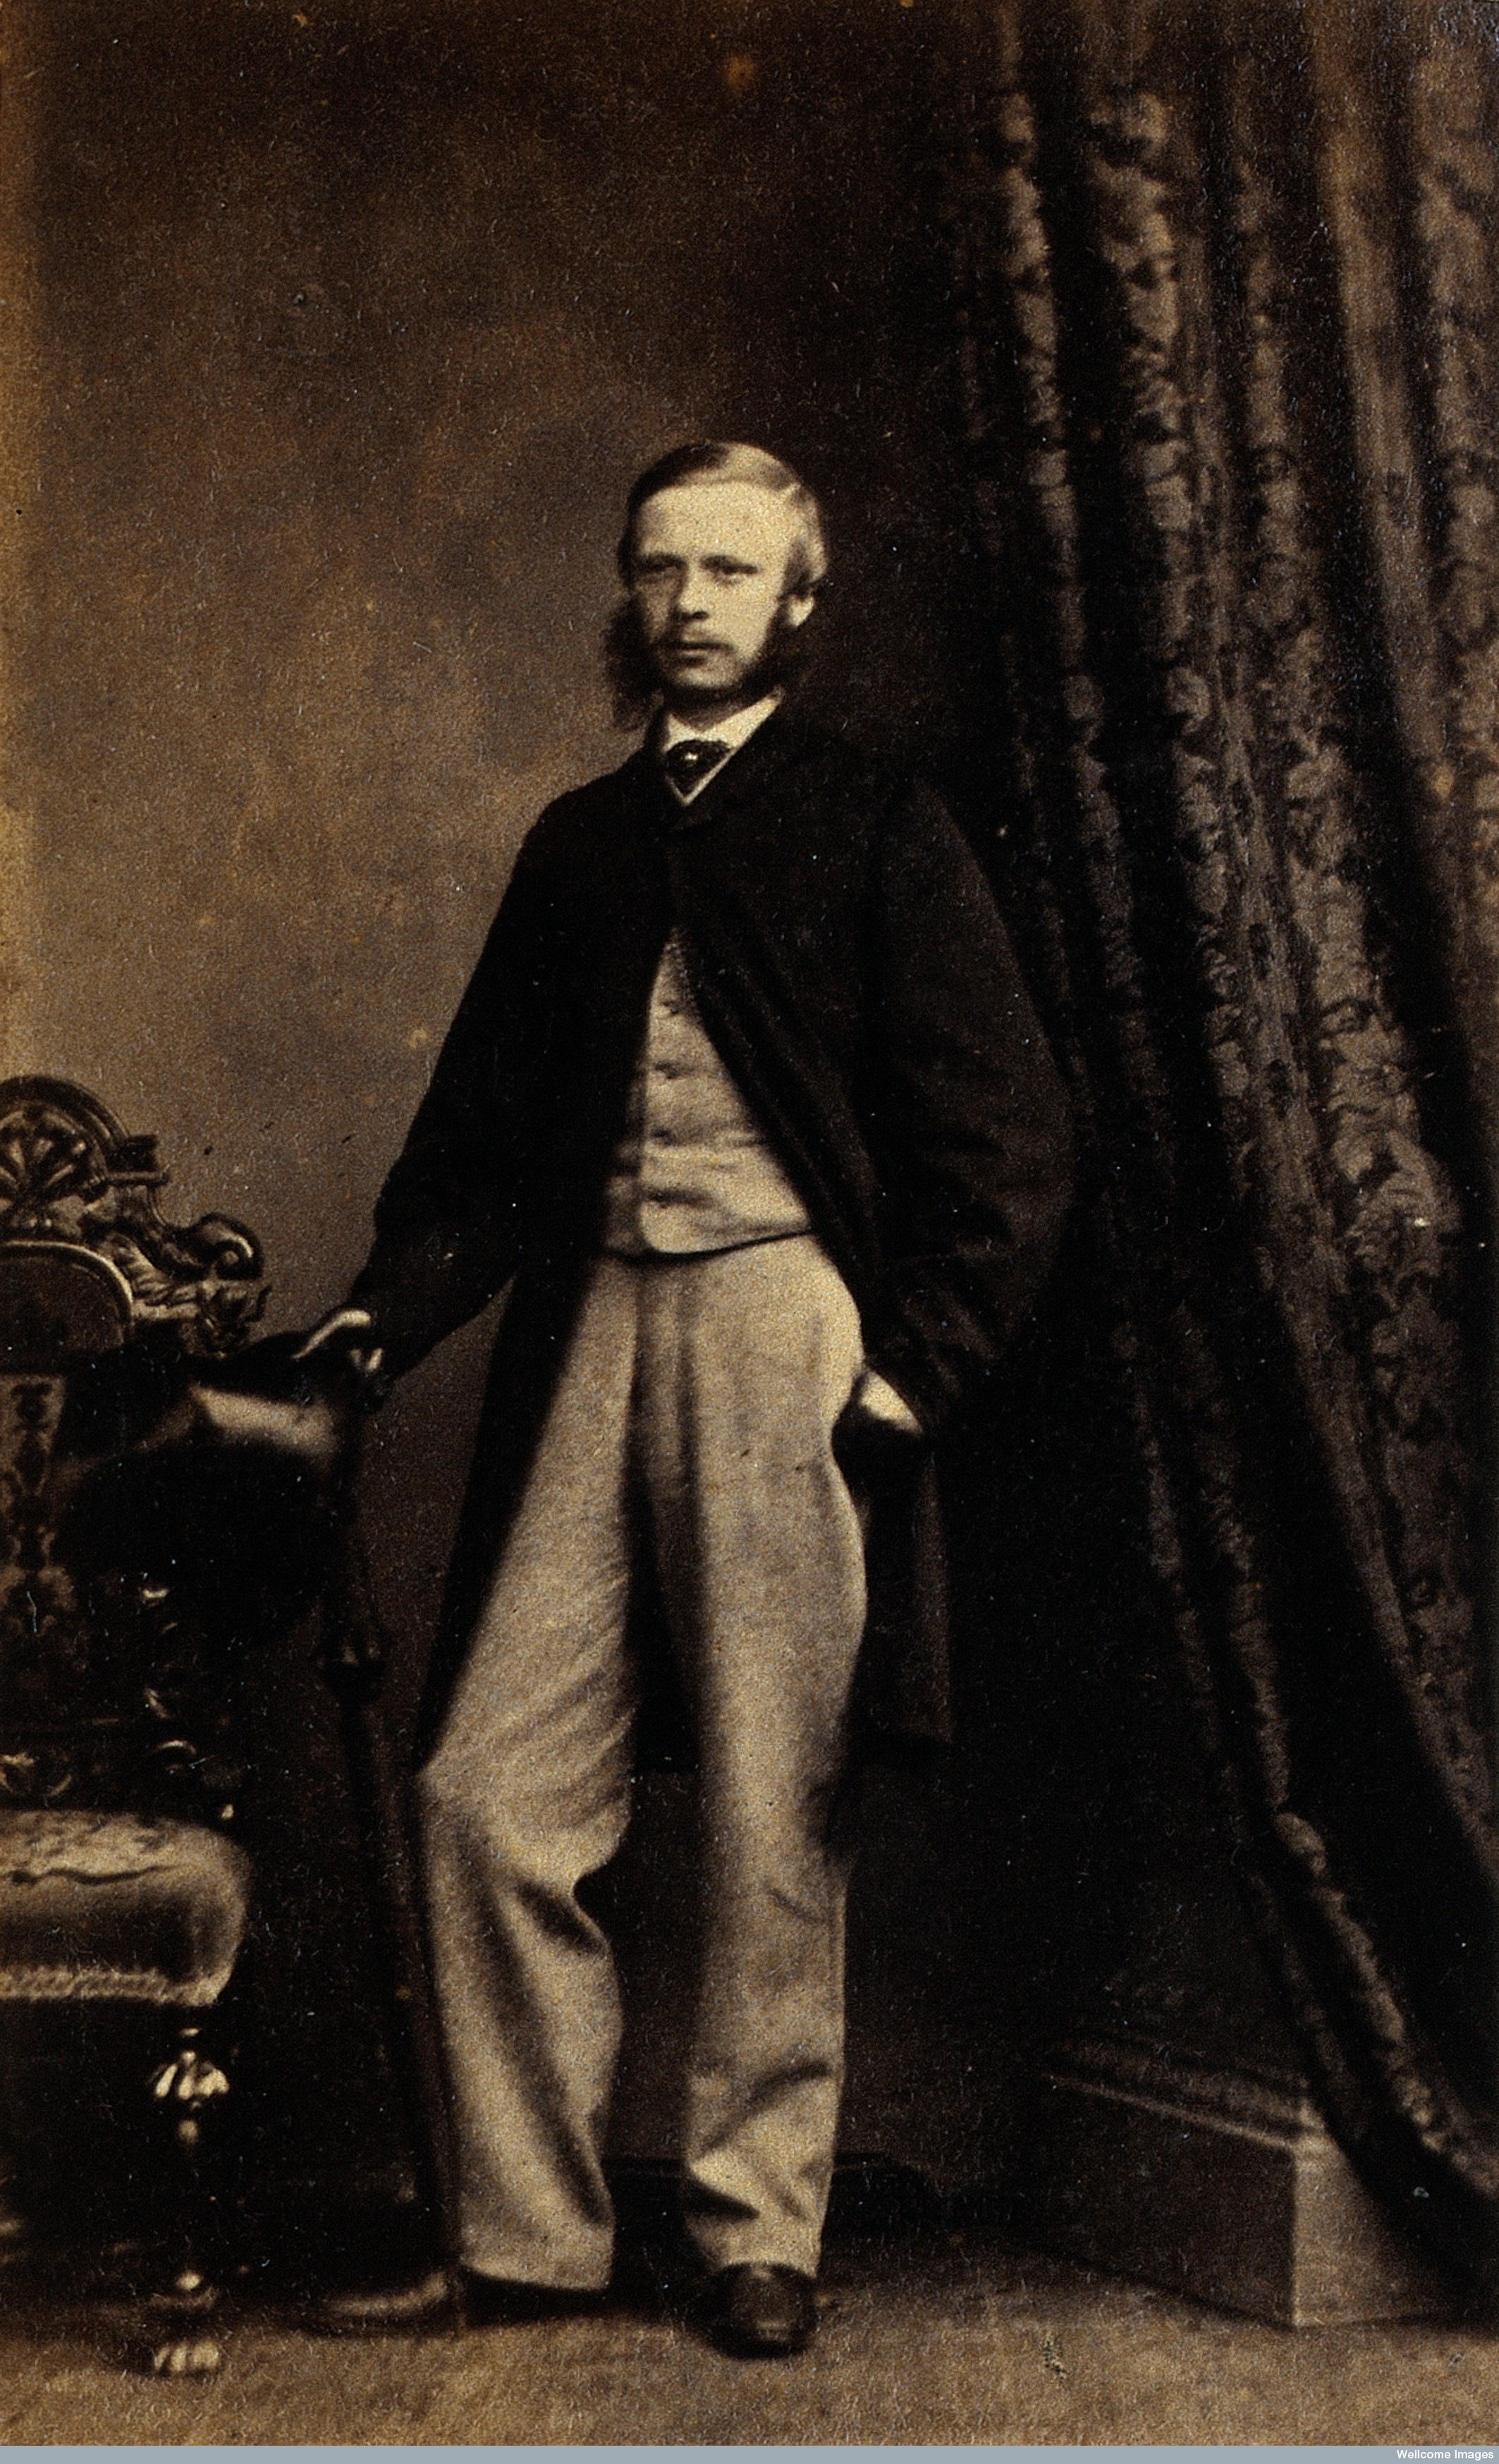 Sir James Crichton Browne